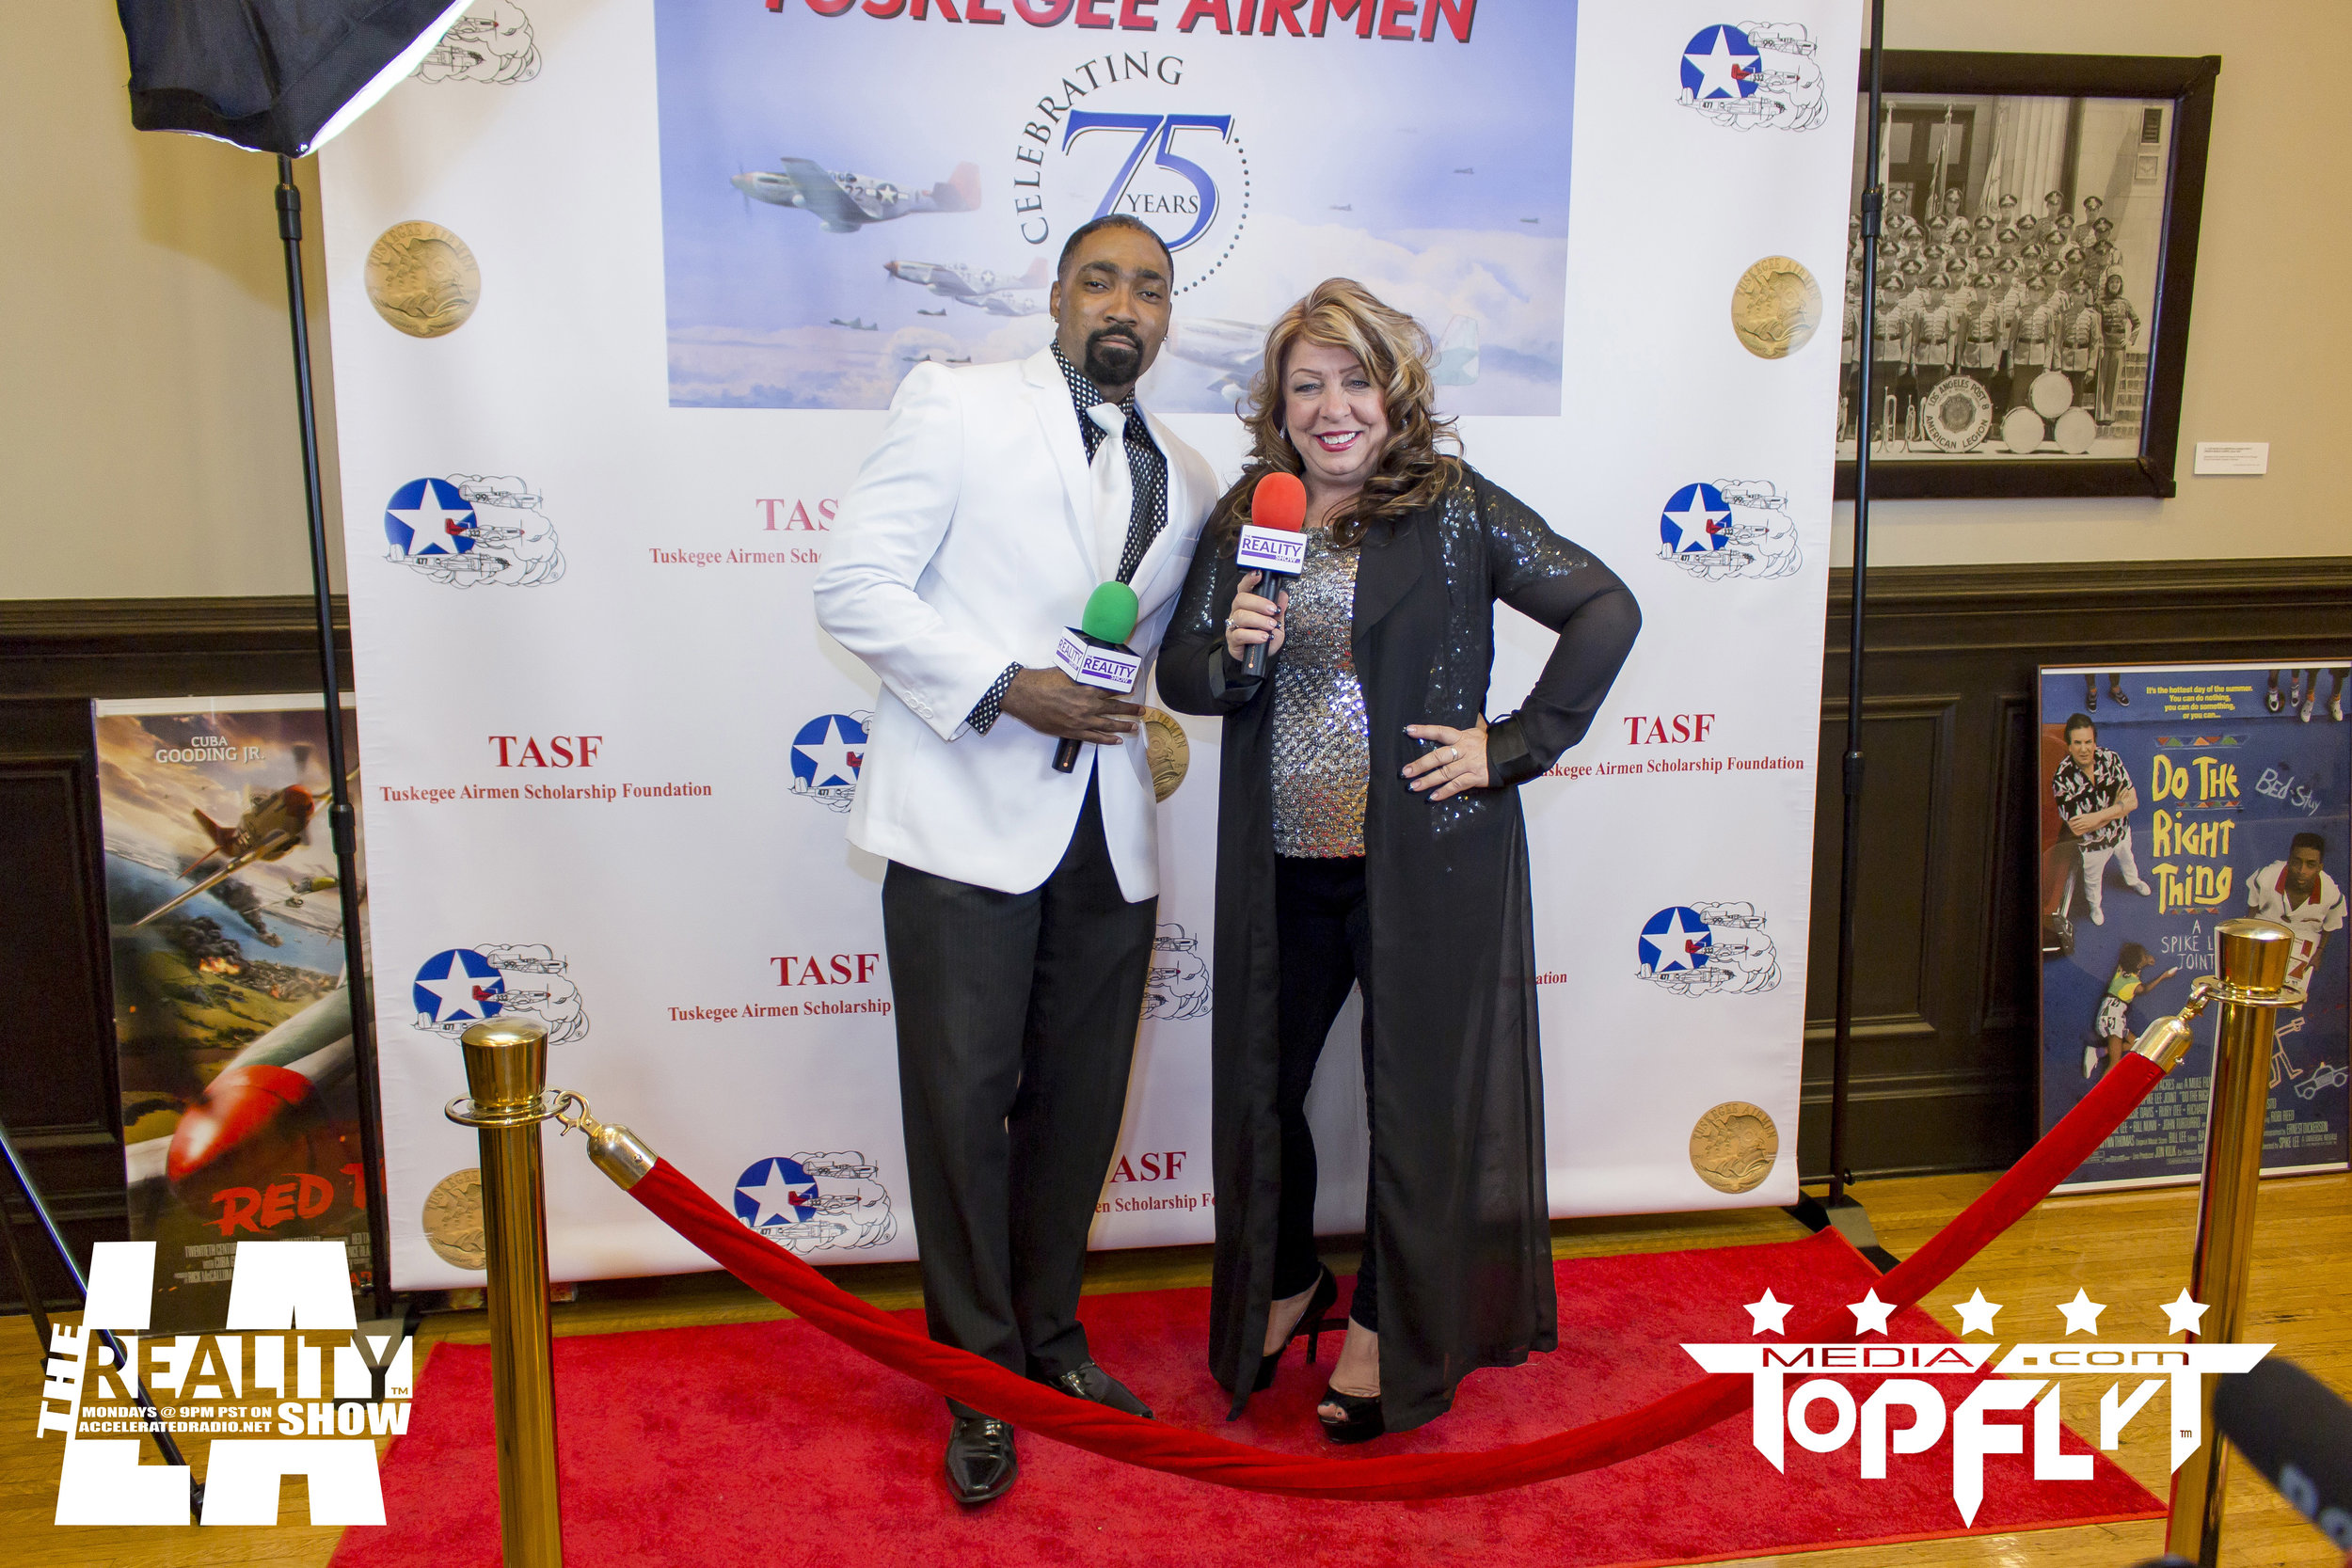 The Reality Show LA - Tuskegee Airmen 75th Anniversary VIP Reception_65.jpg